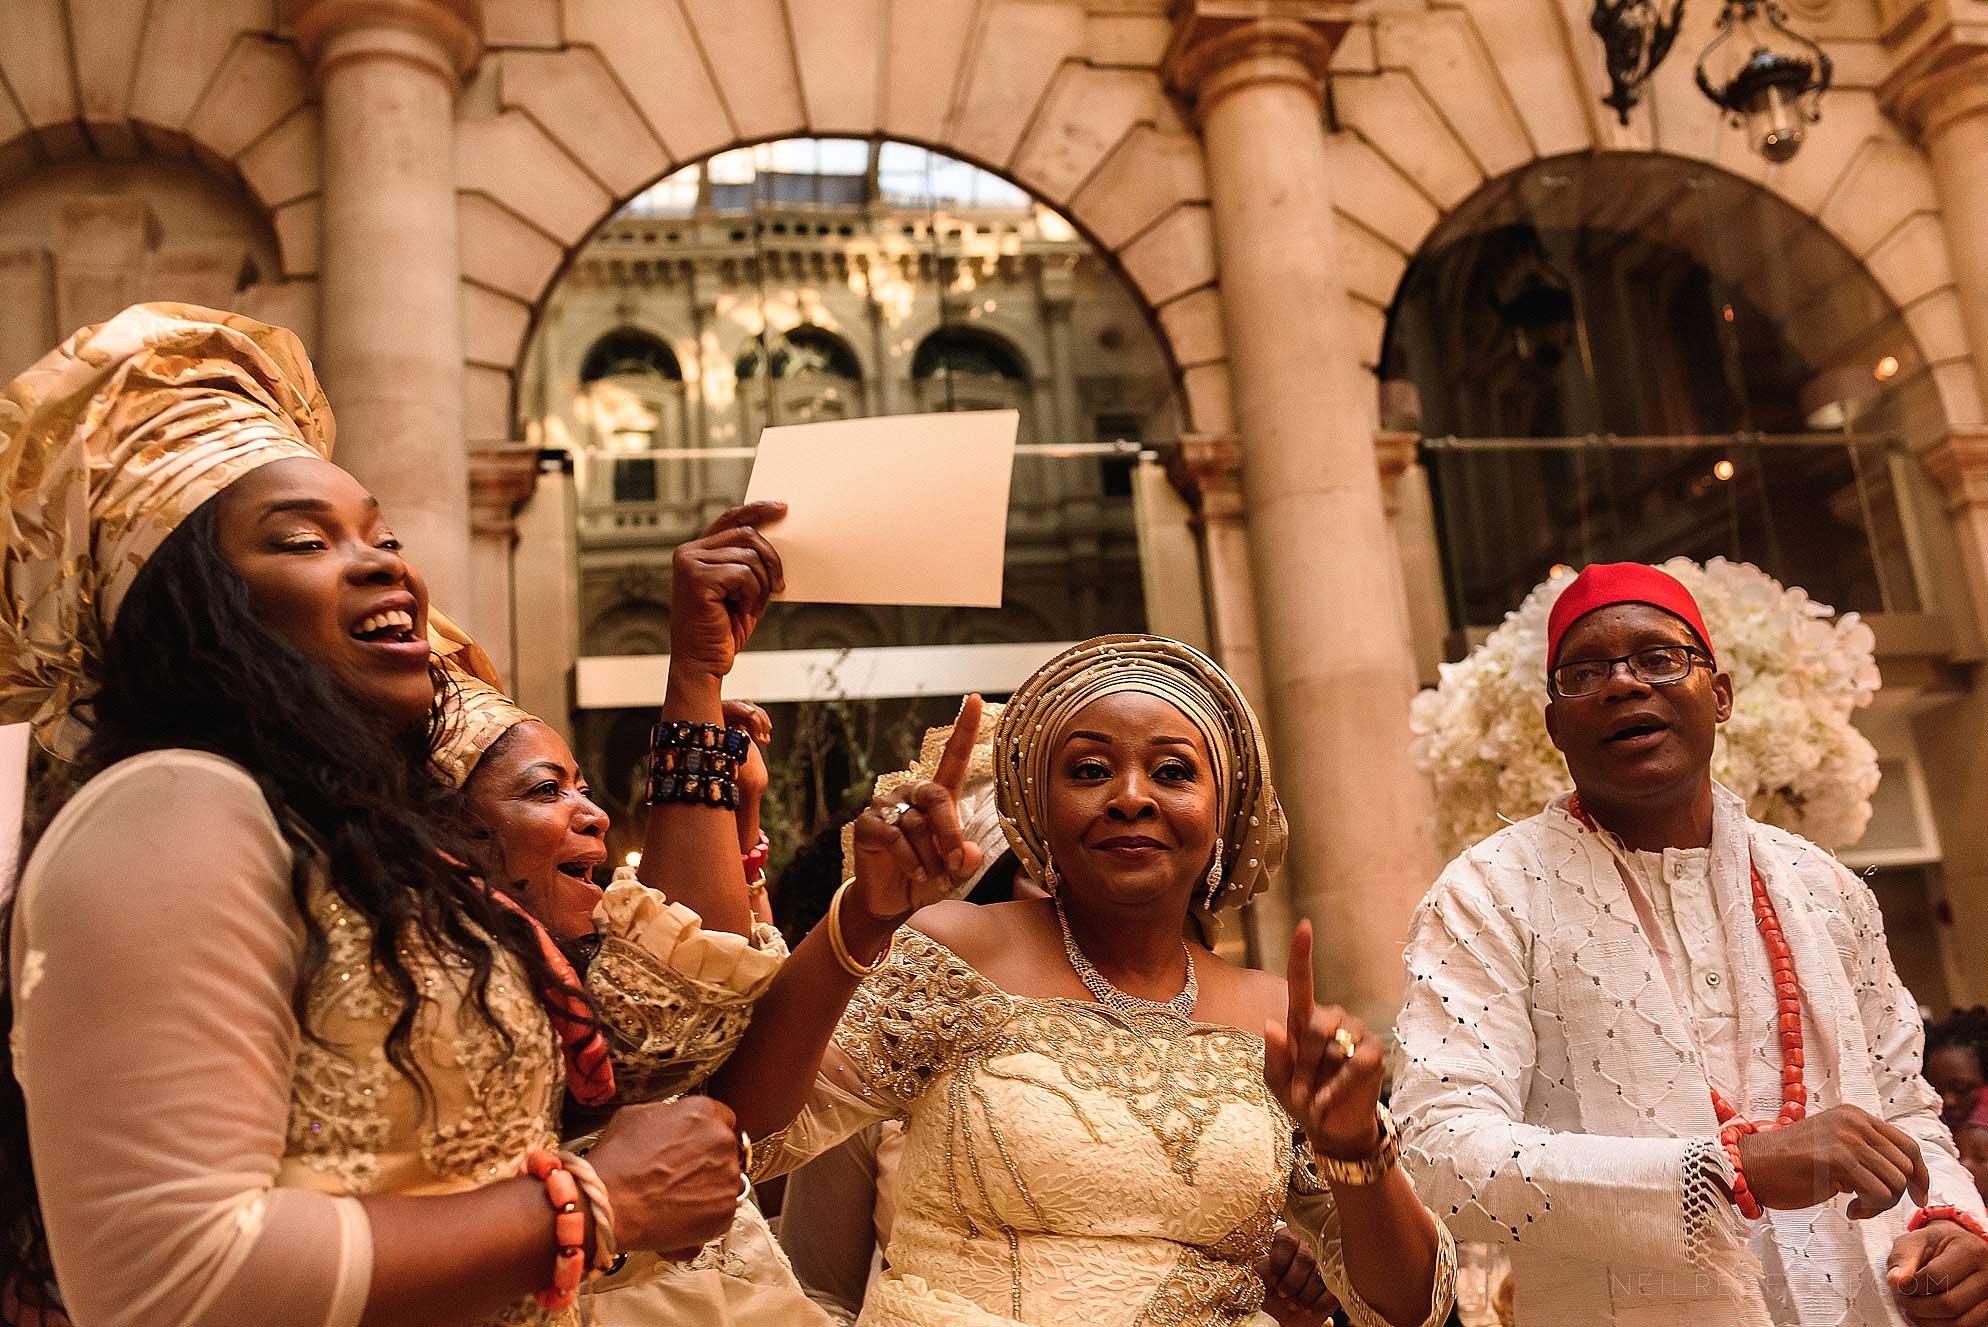 Nigerian wedding party dancing